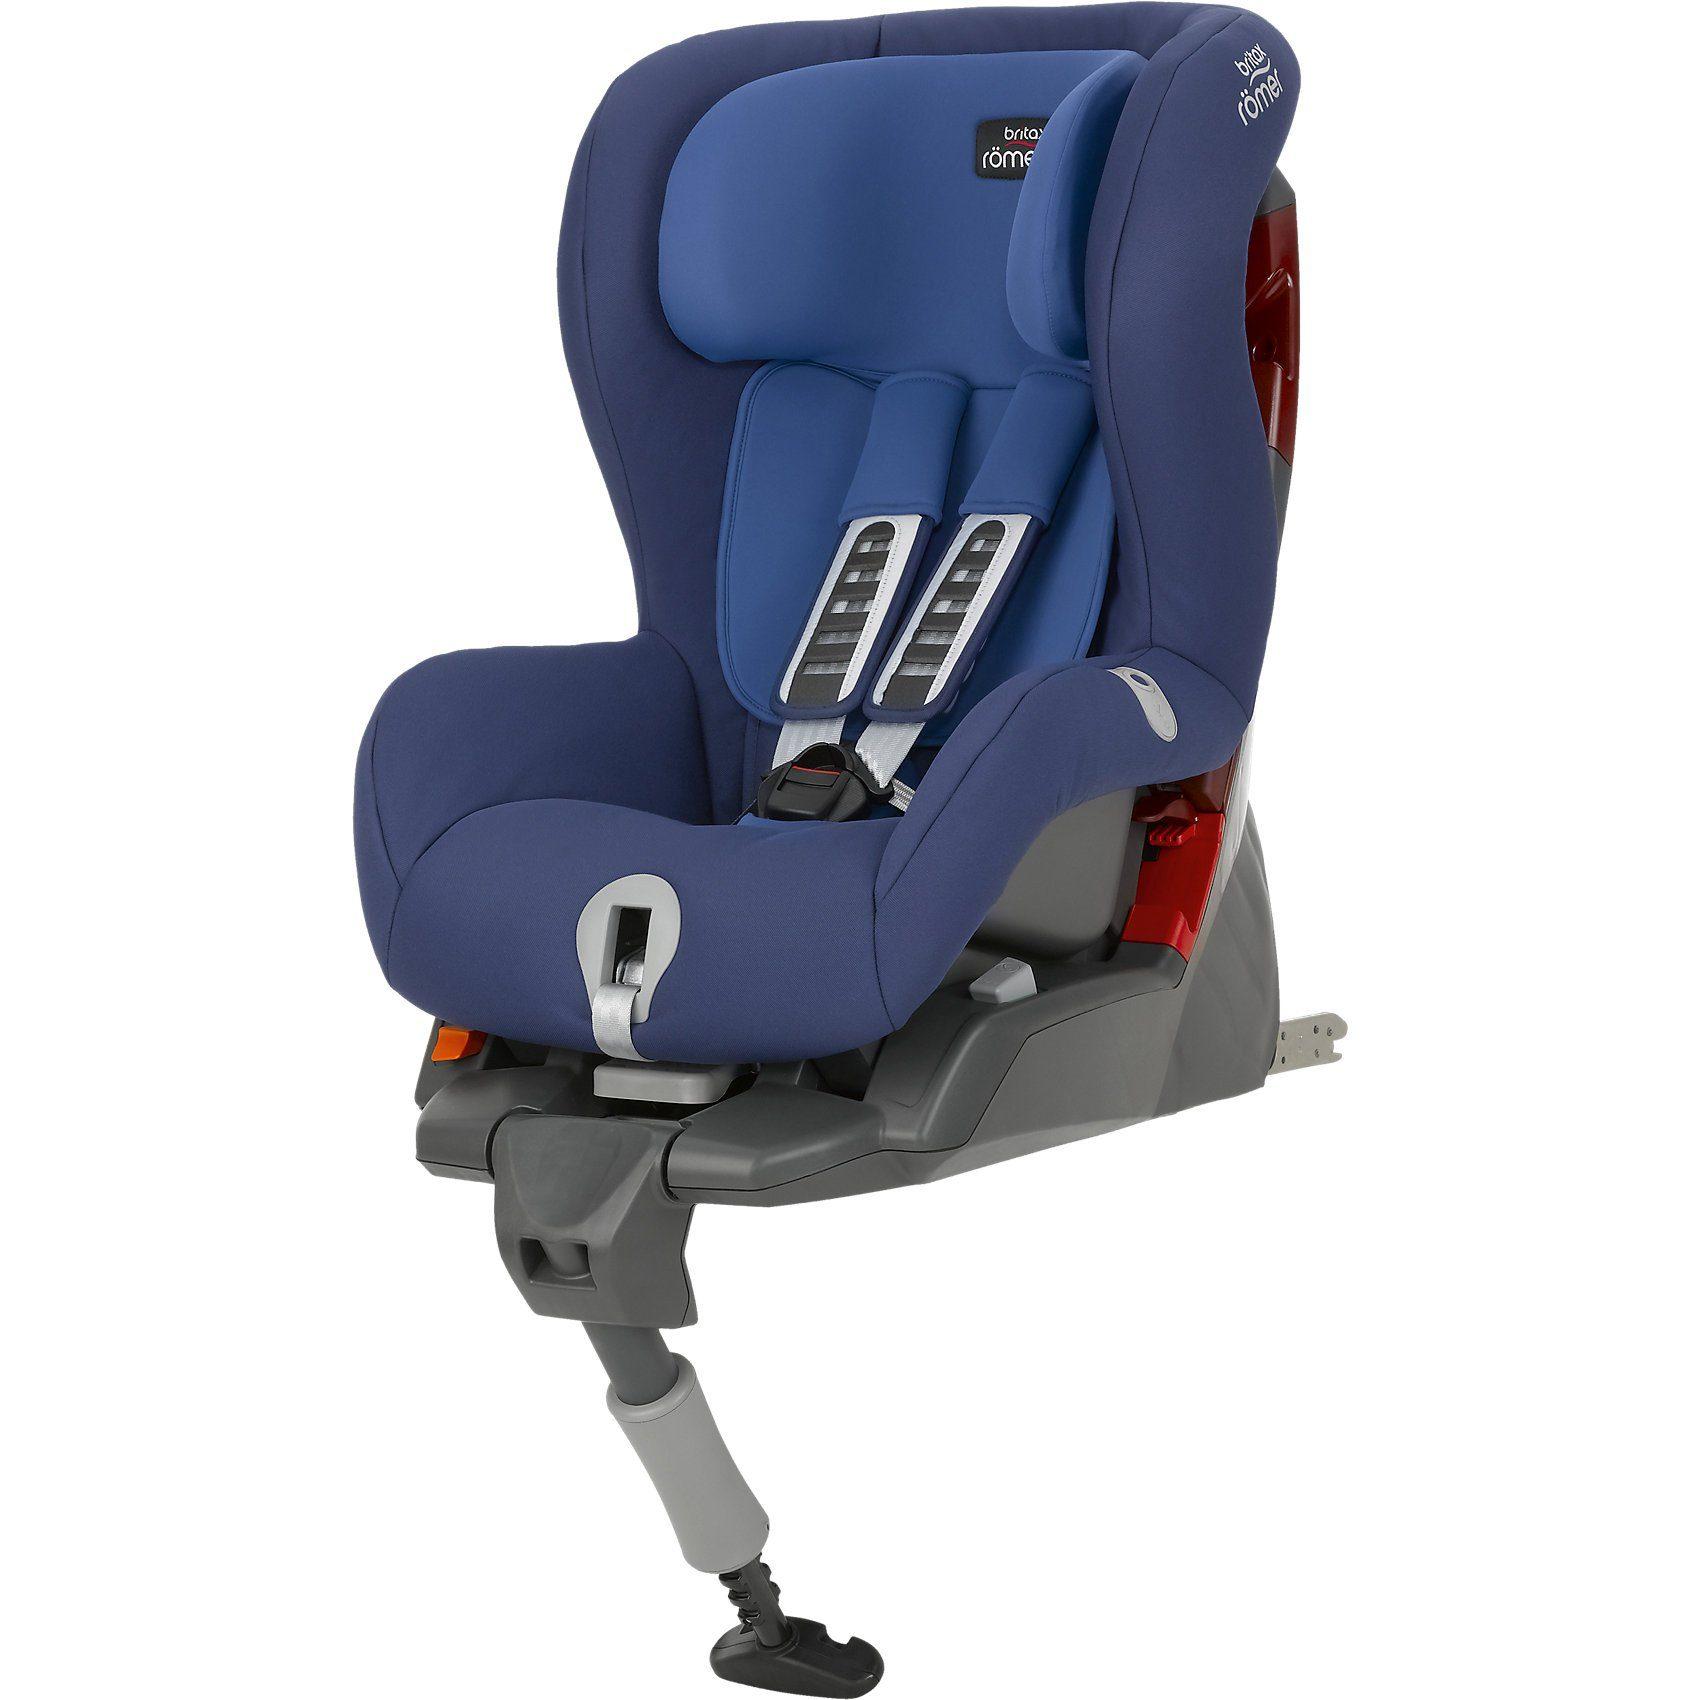 Britax Römer Auto-Kindersitz Safefix Plus, Ocean Blue, 2016